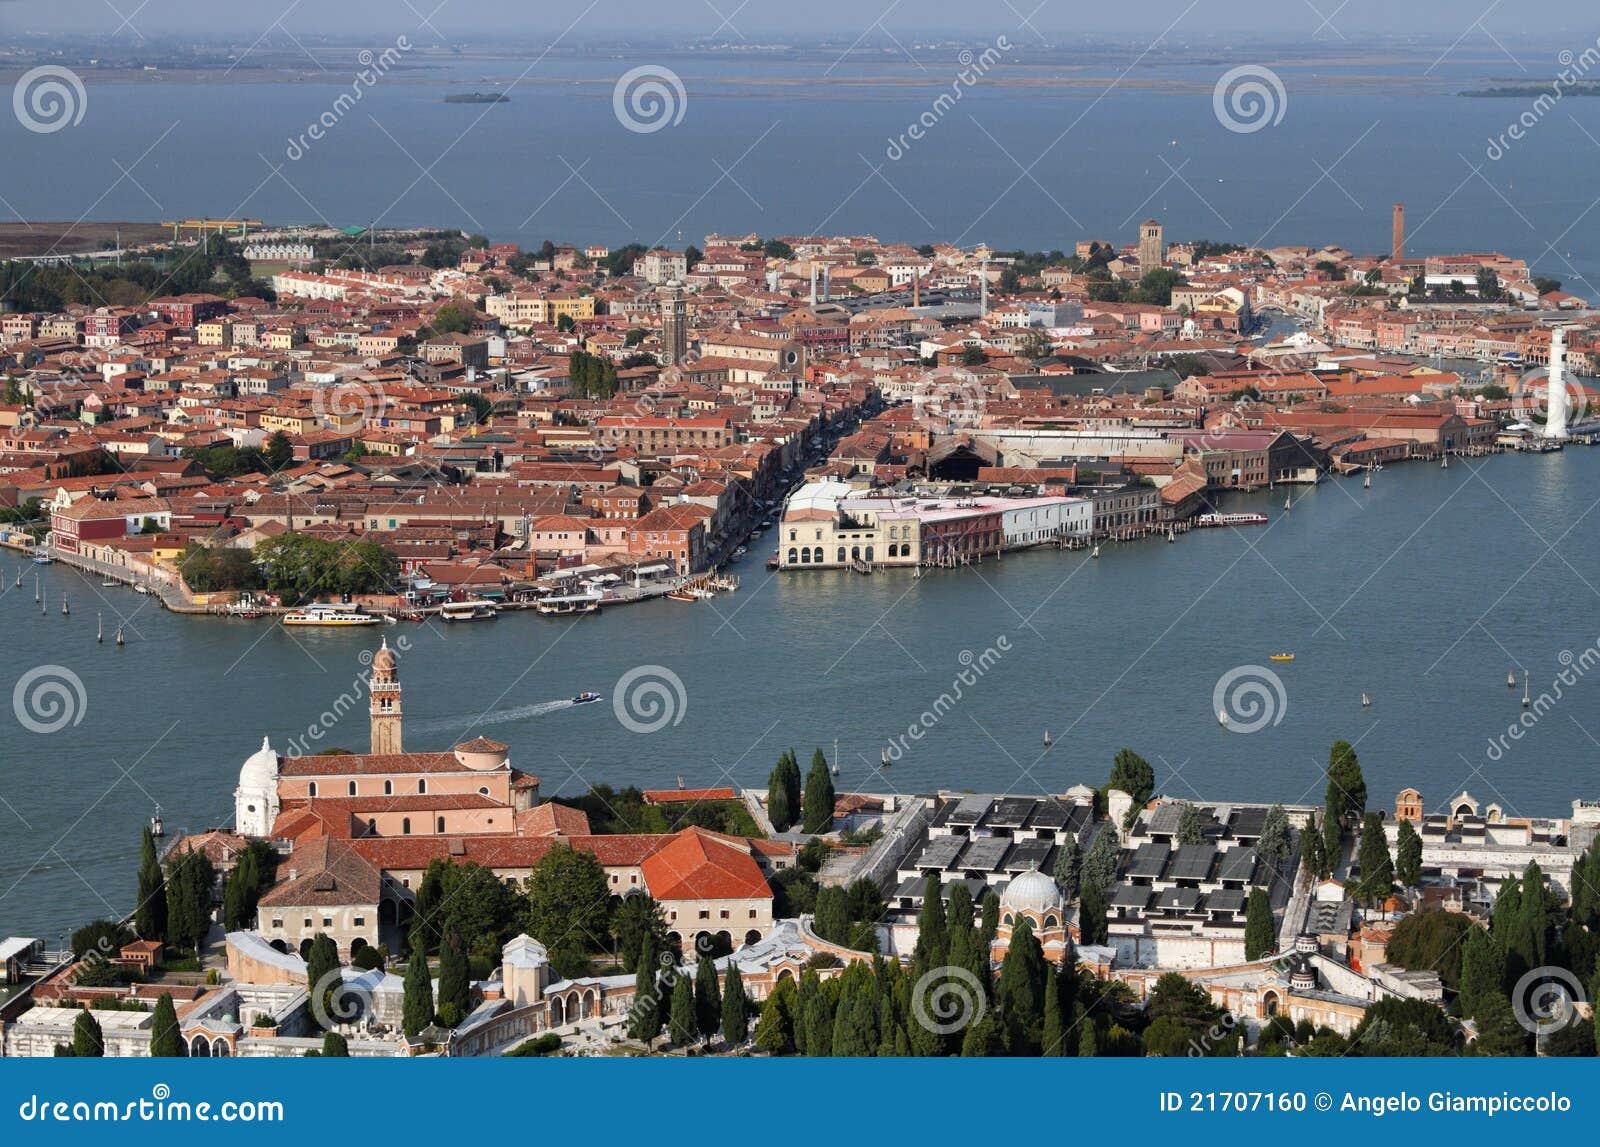 Italien venedig murano insel insel str michele - Murano bilder ...